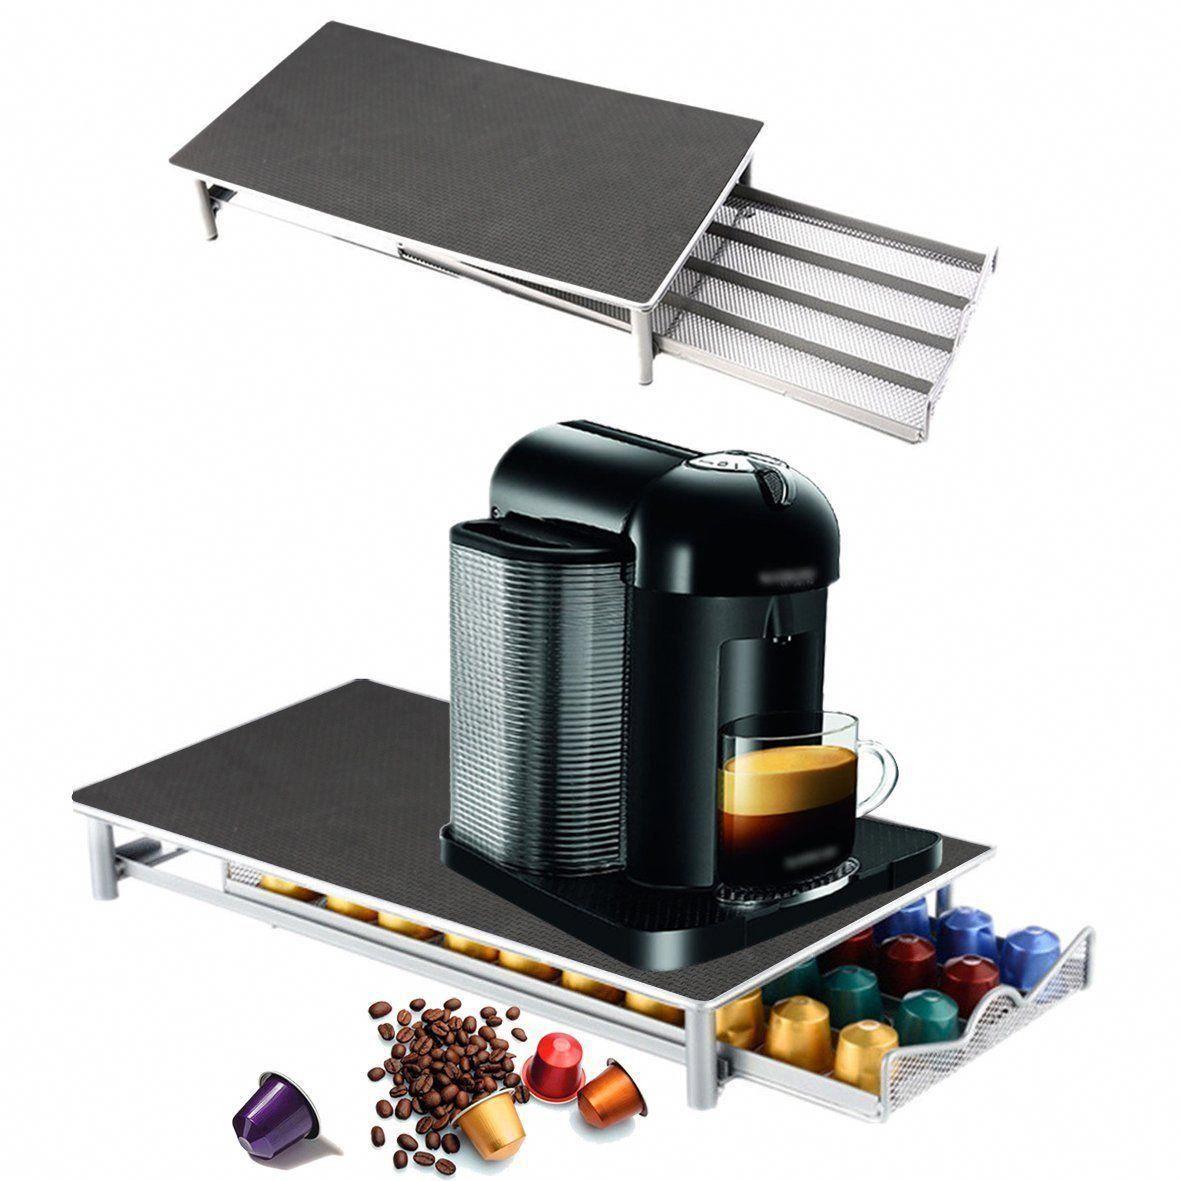 COFFEE MACHINE STAND /& CAPSULE POD STORAGE HOLDER DRAWER NESPRESSO DOLCE GUSTO